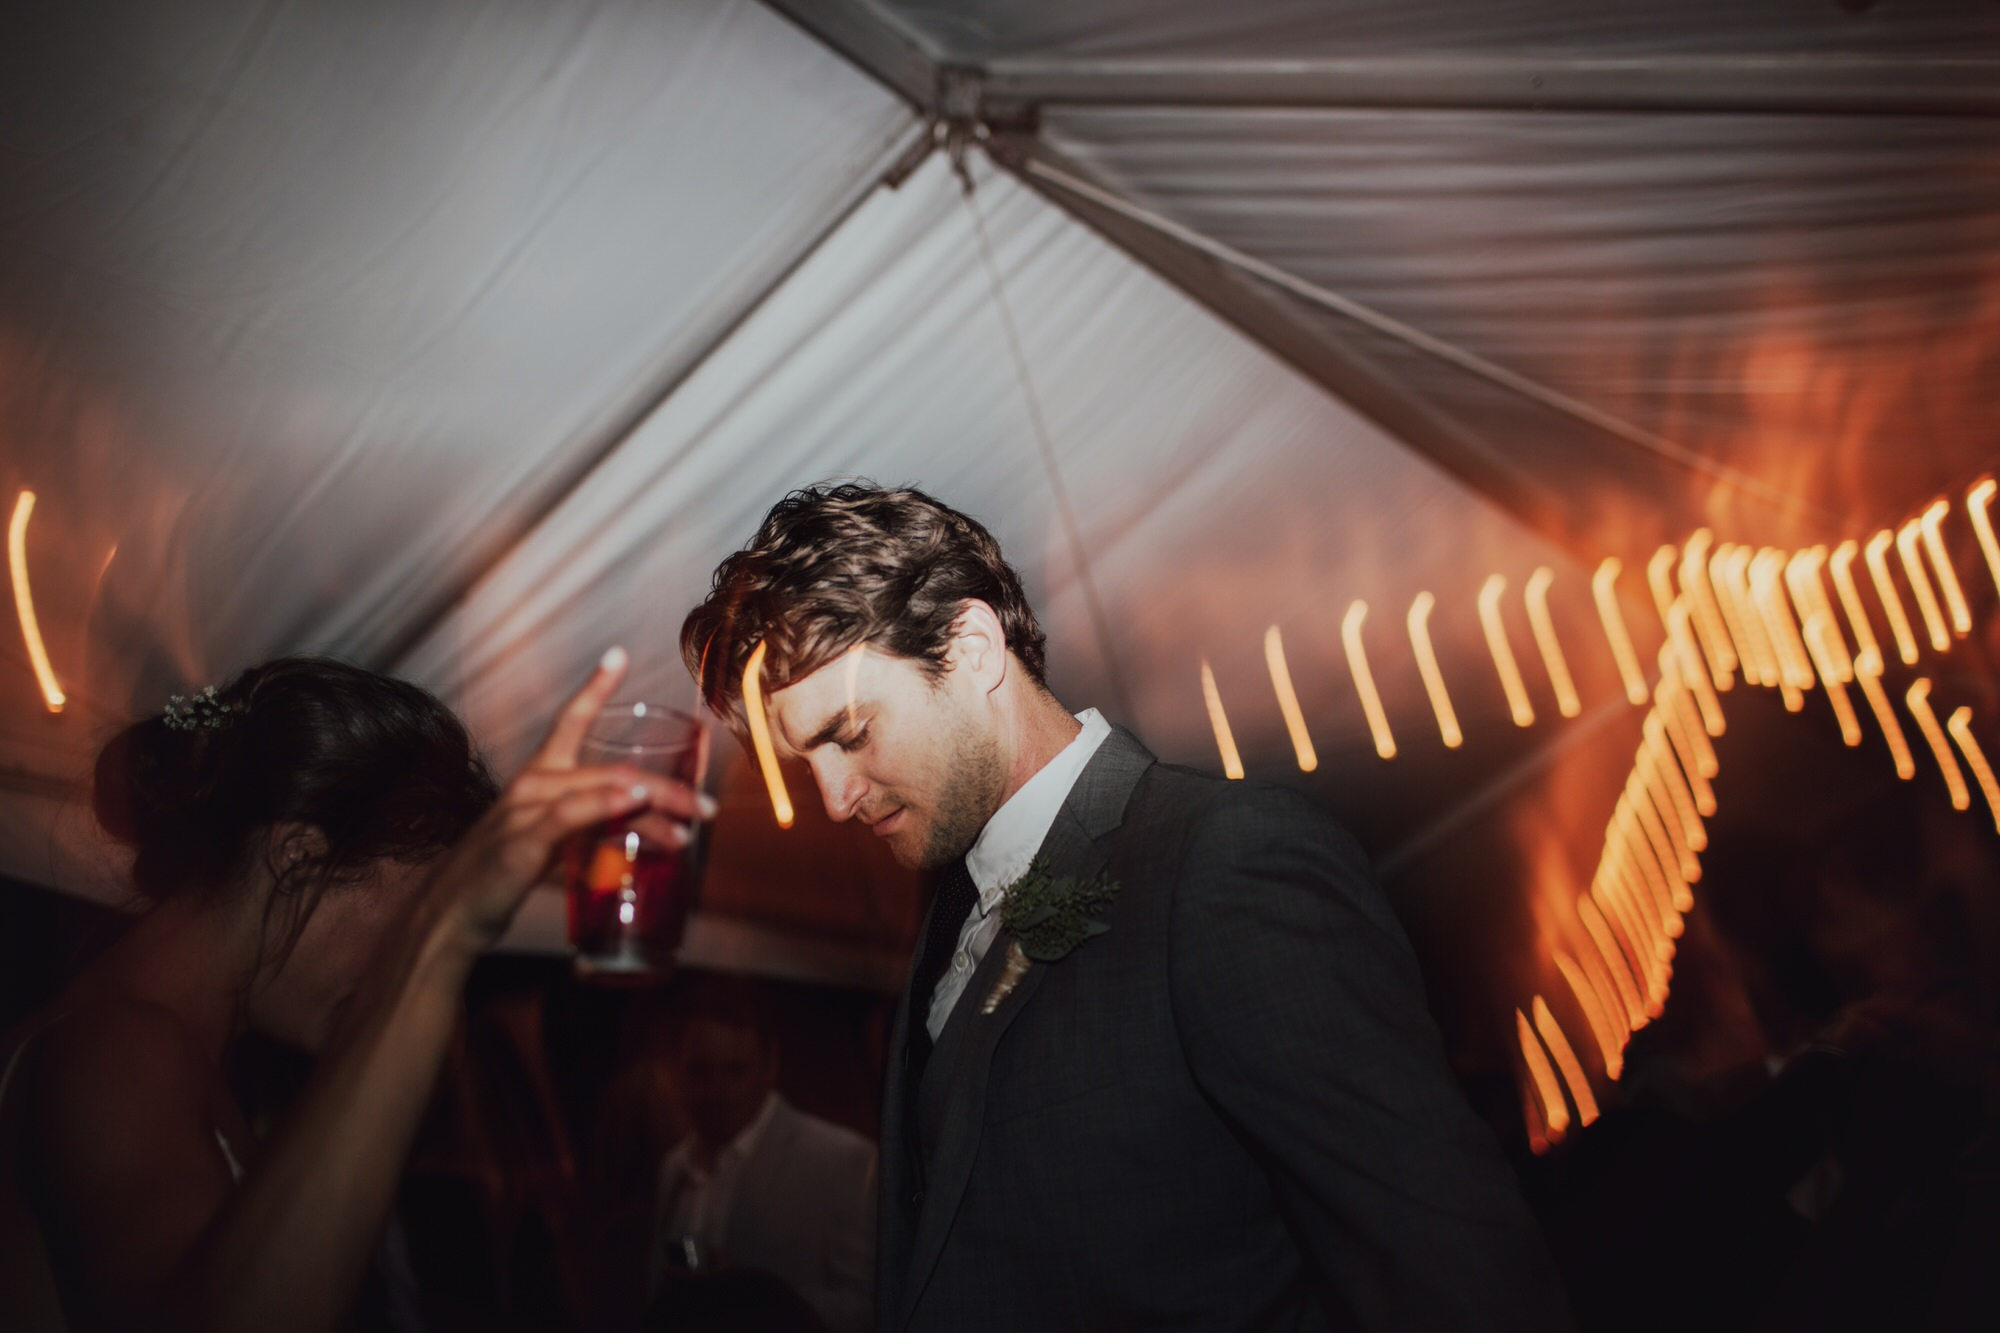 emily-aaron-rochester-new-york-wedding-photographer-130.JPG